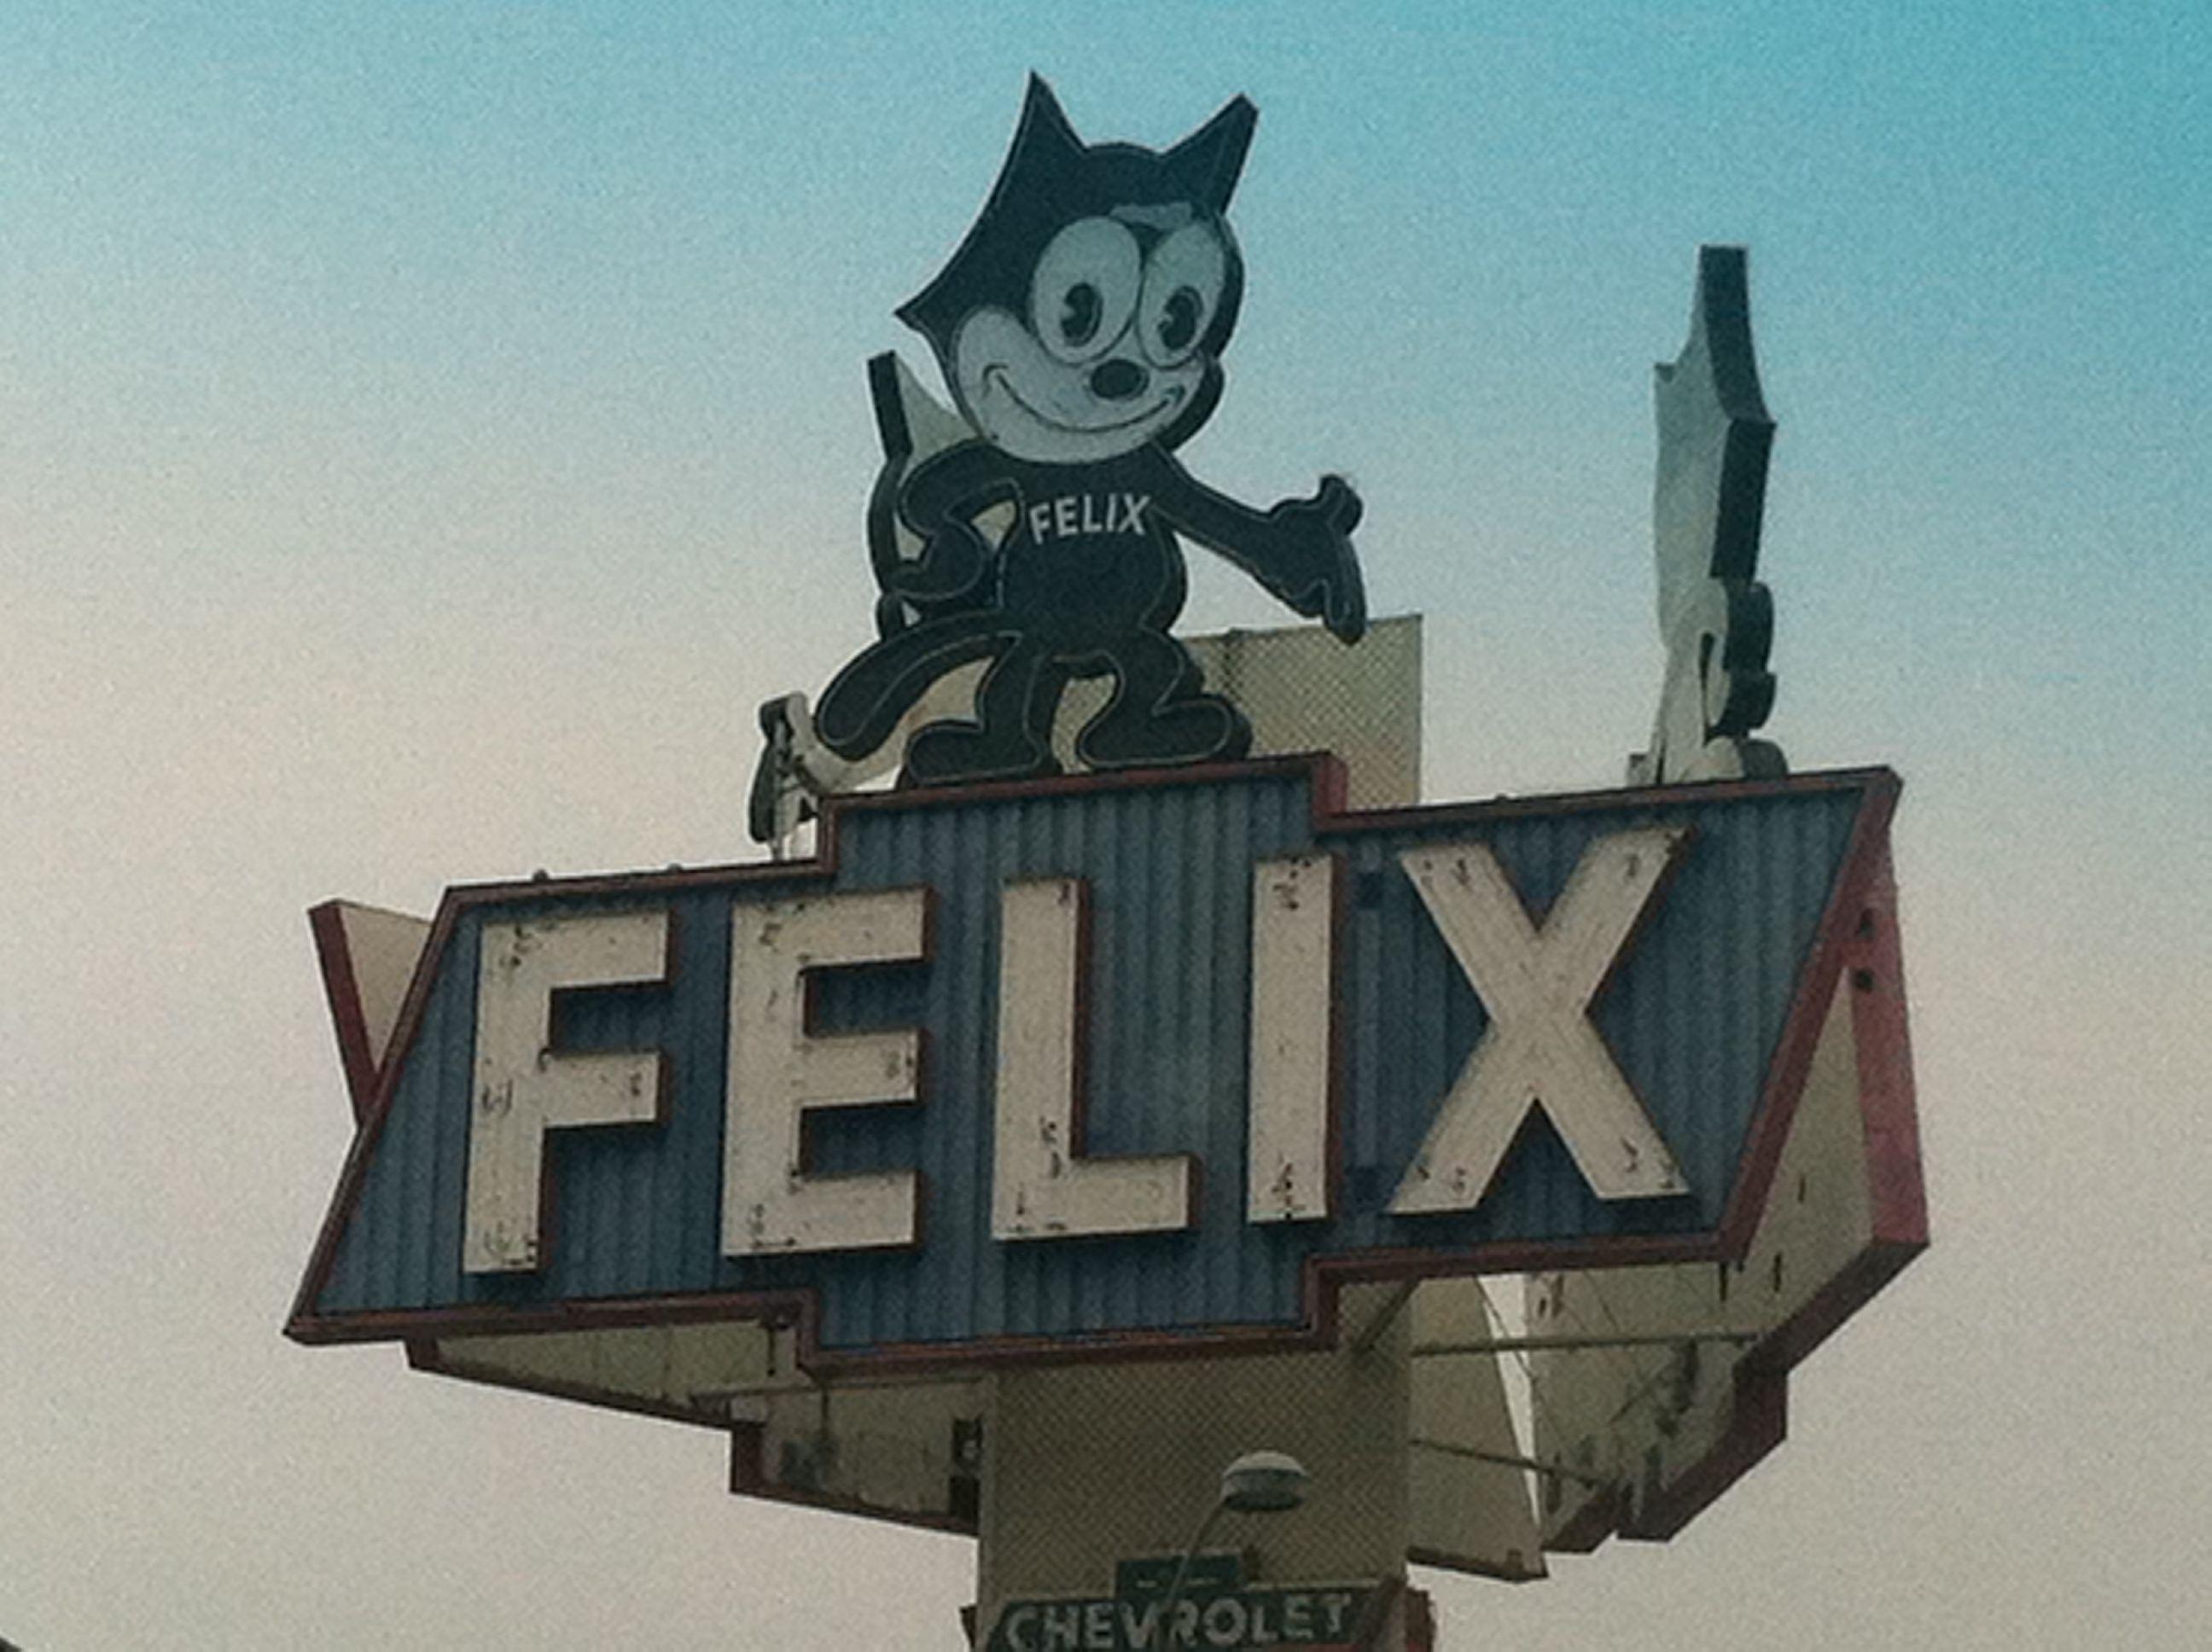 Felix Chevrolet, Los Angeles